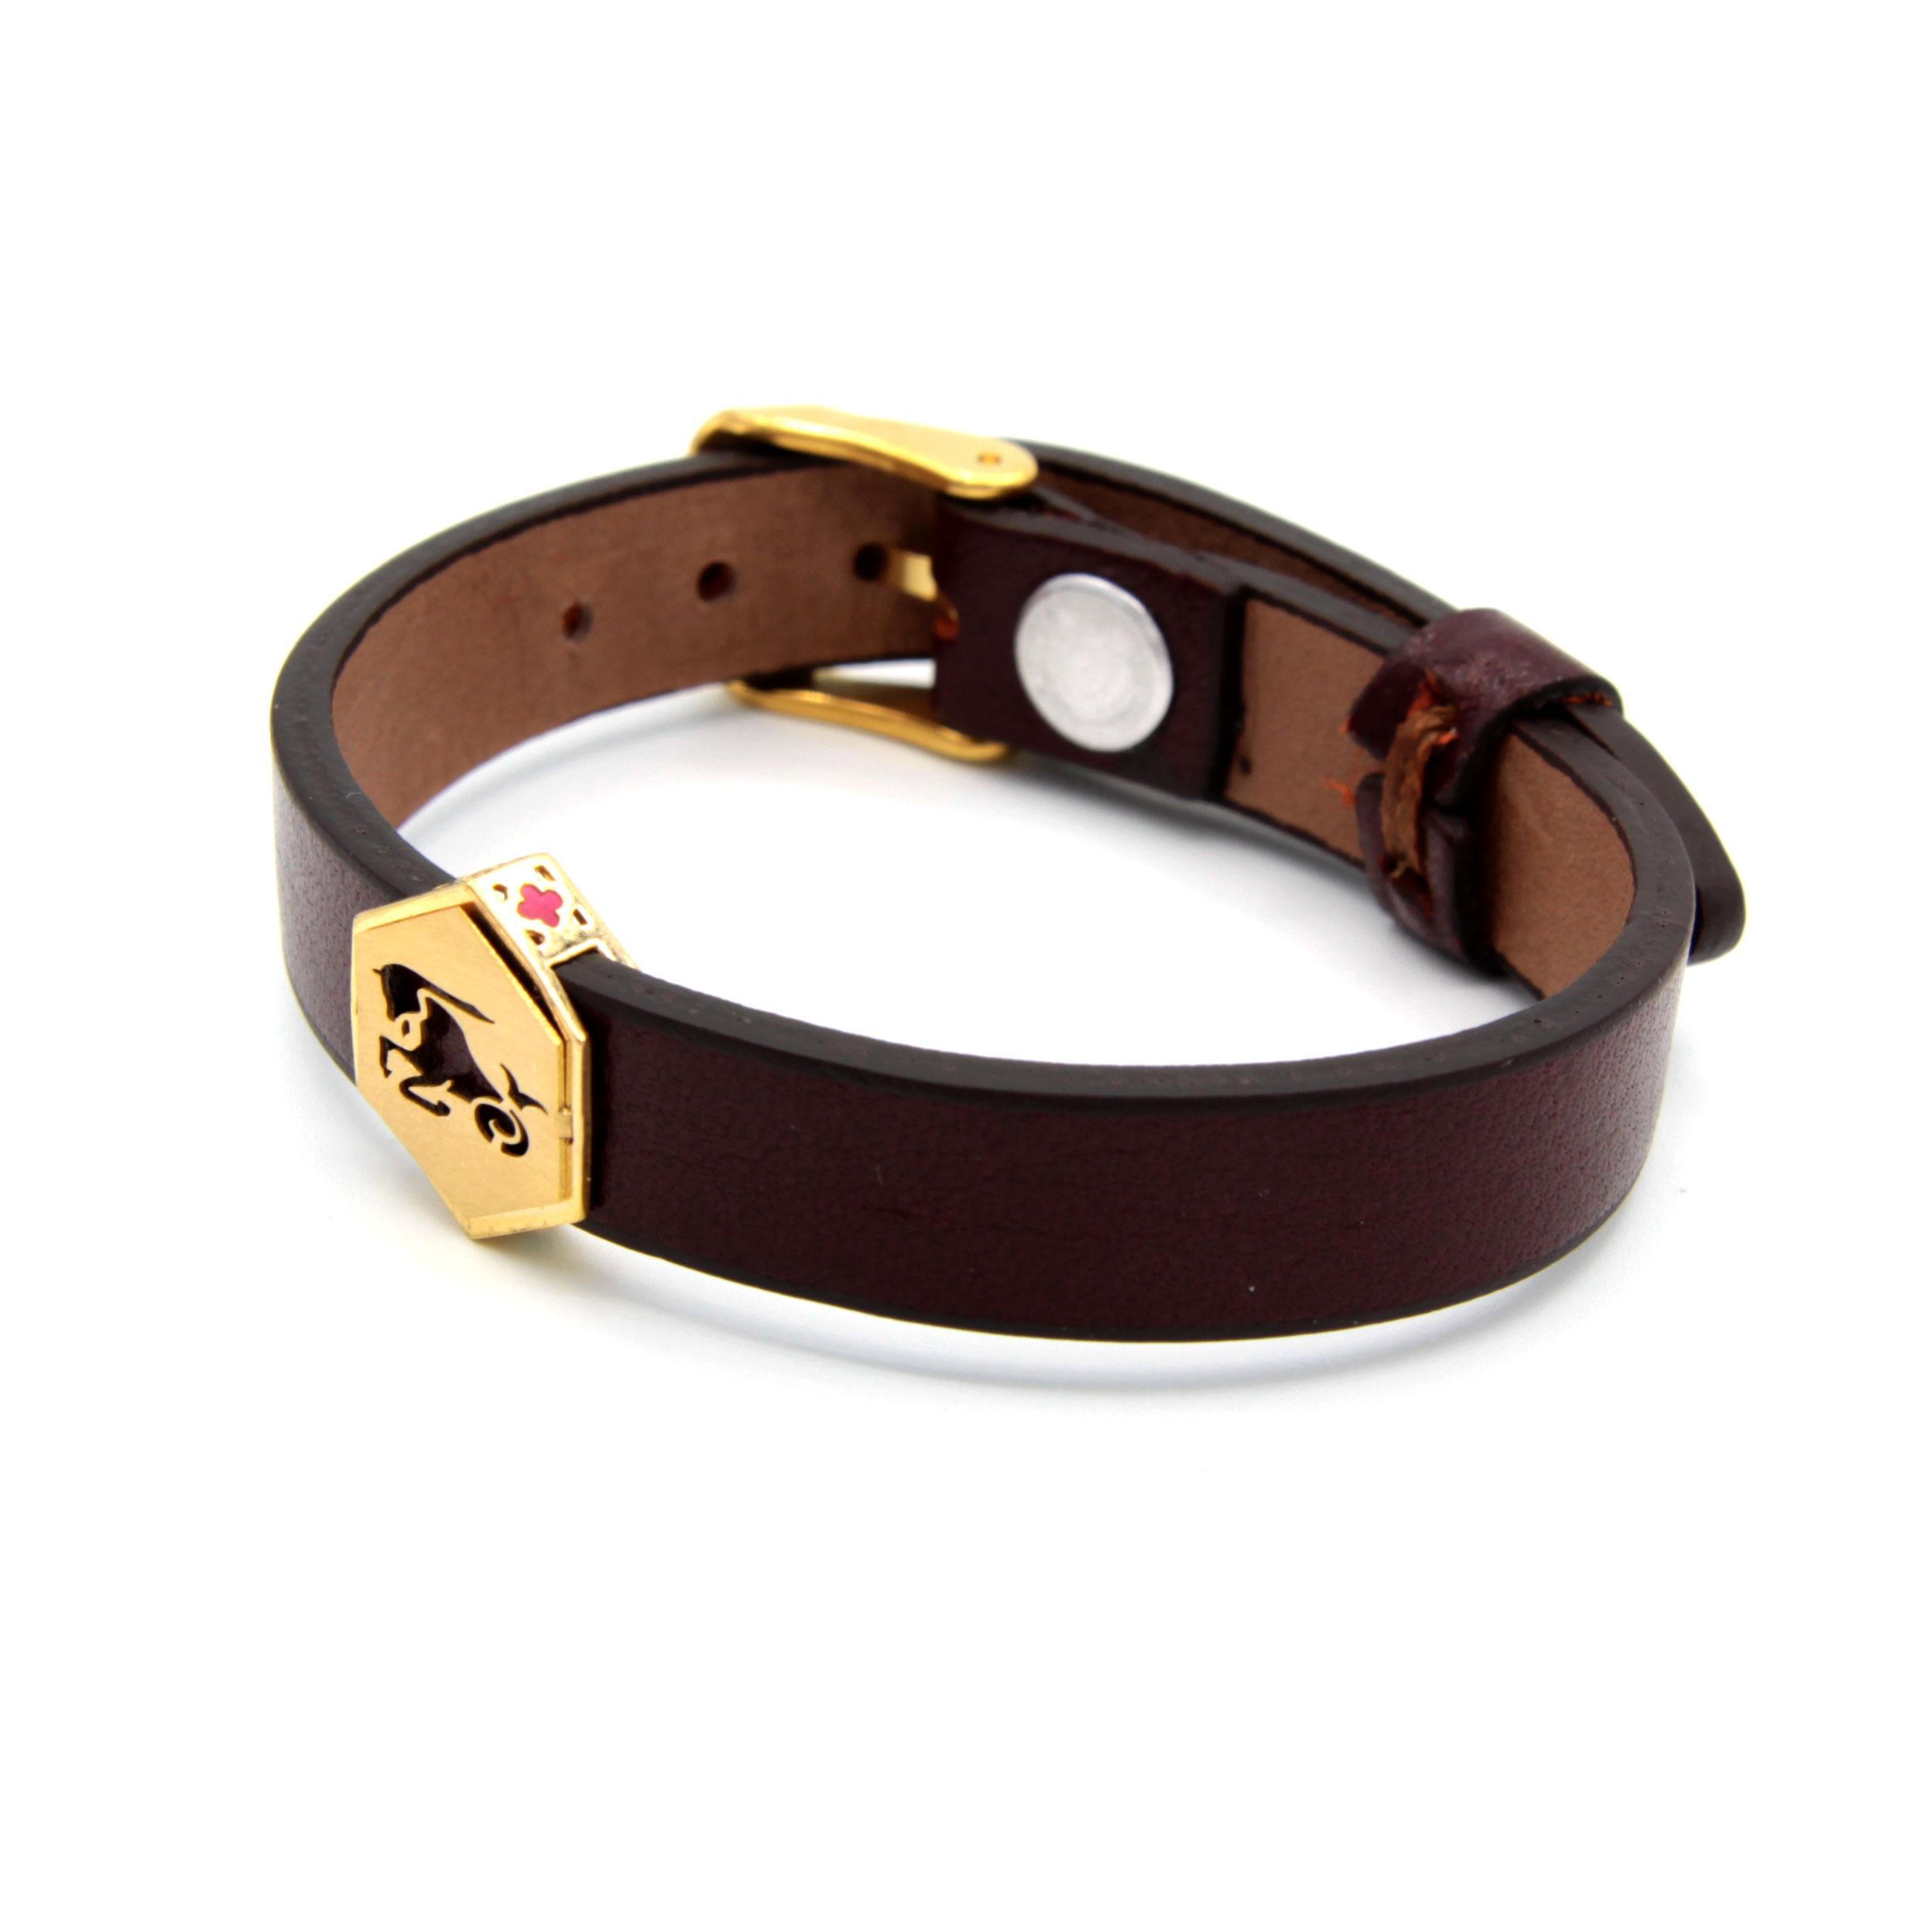 دستبند چرم و طلا -ماه تولد دی -کد0611.1.9.2.2.2.10